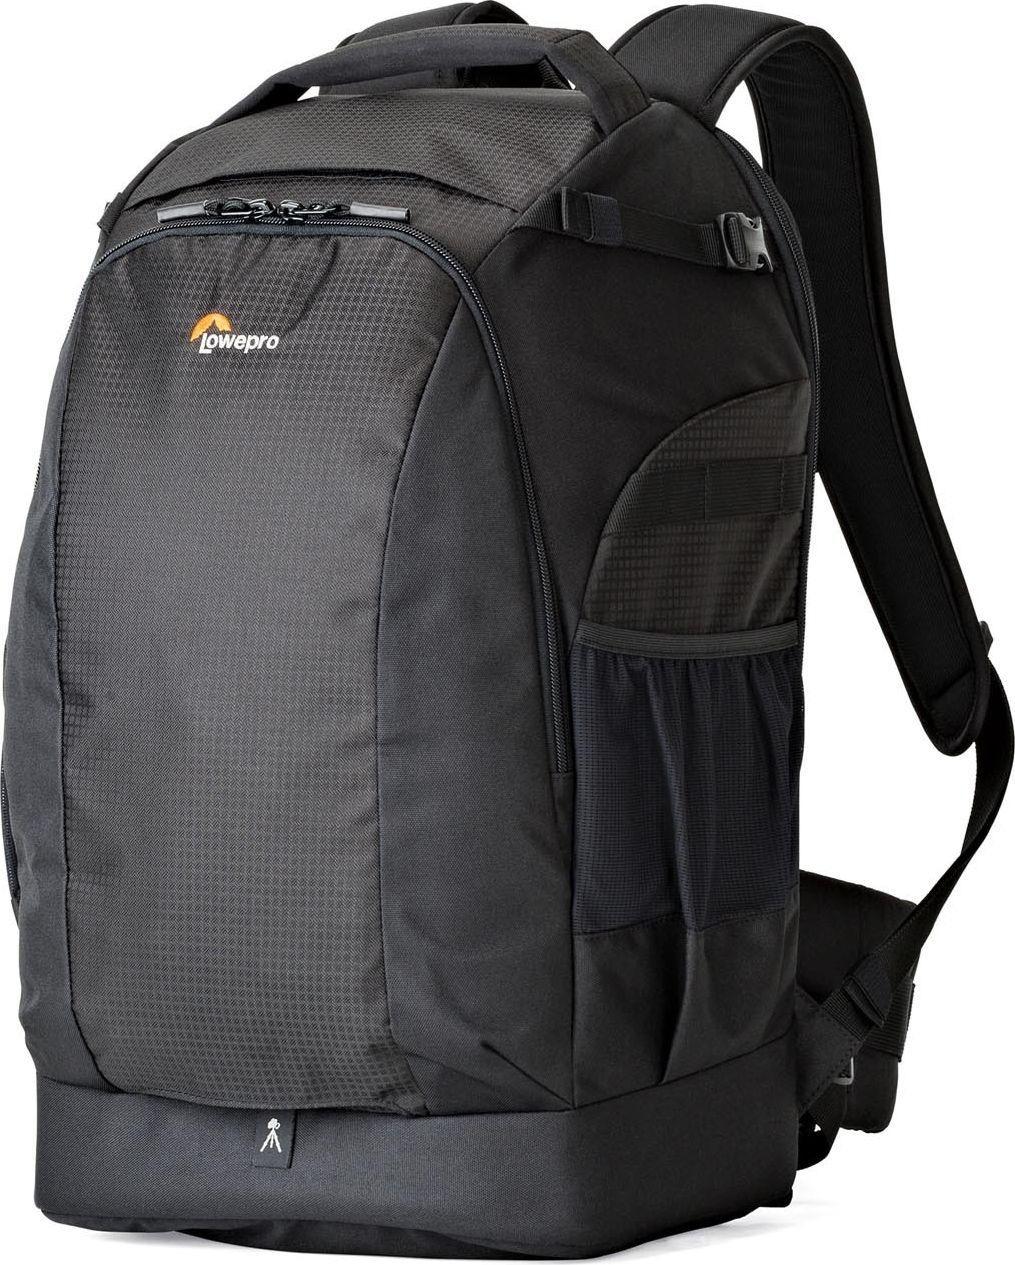 Рюкзак Lowepro Flipside 500 AW II, LP37131-PWW, черный